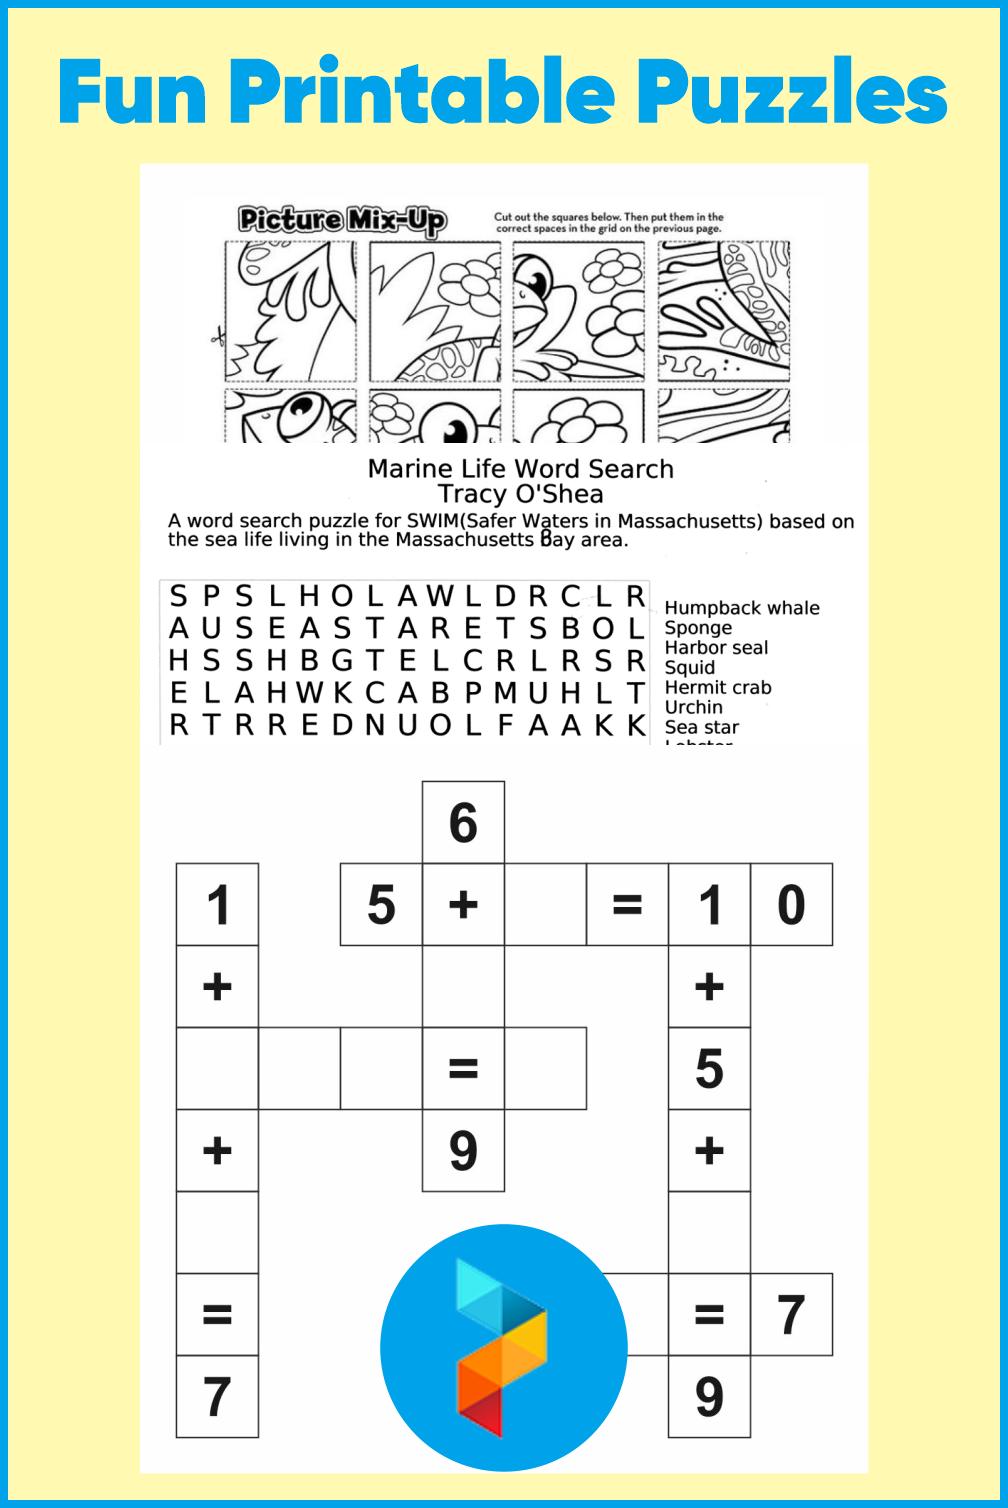 Fun Printable Puzzles